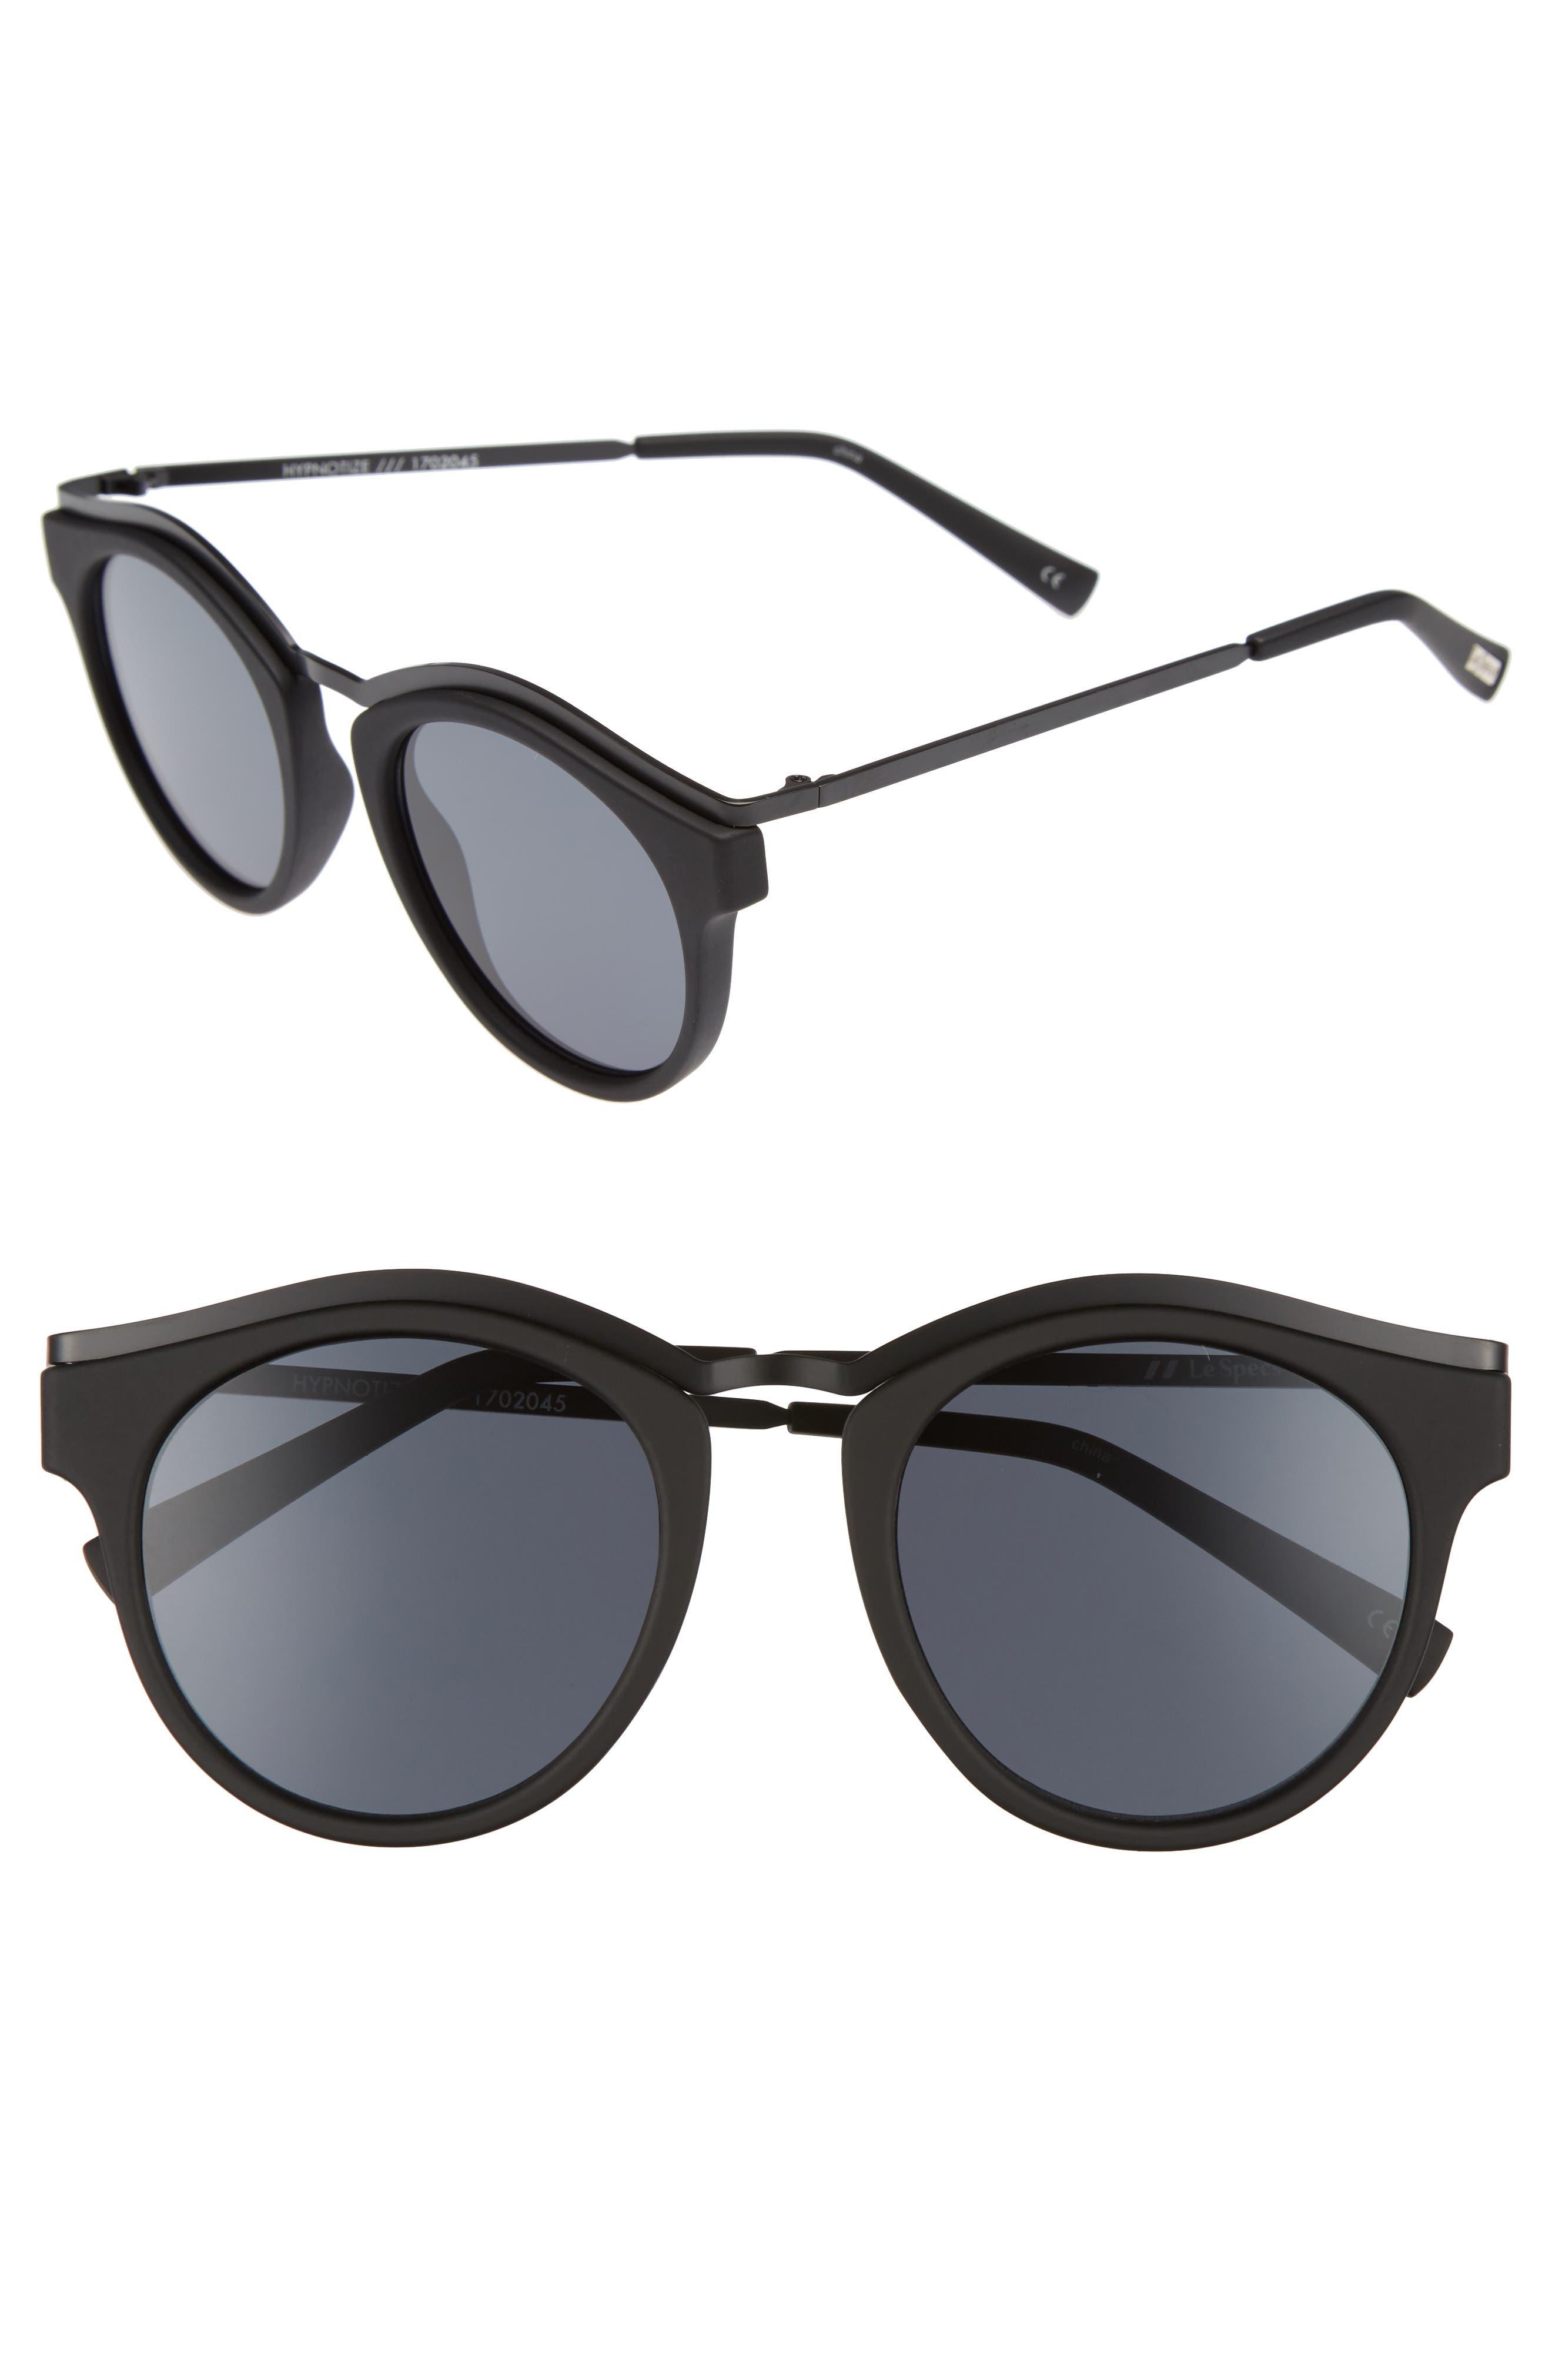 Hypnotize 50mm Round Sunglasses,                             Main thumbnail 1, color,                             Black Rubber